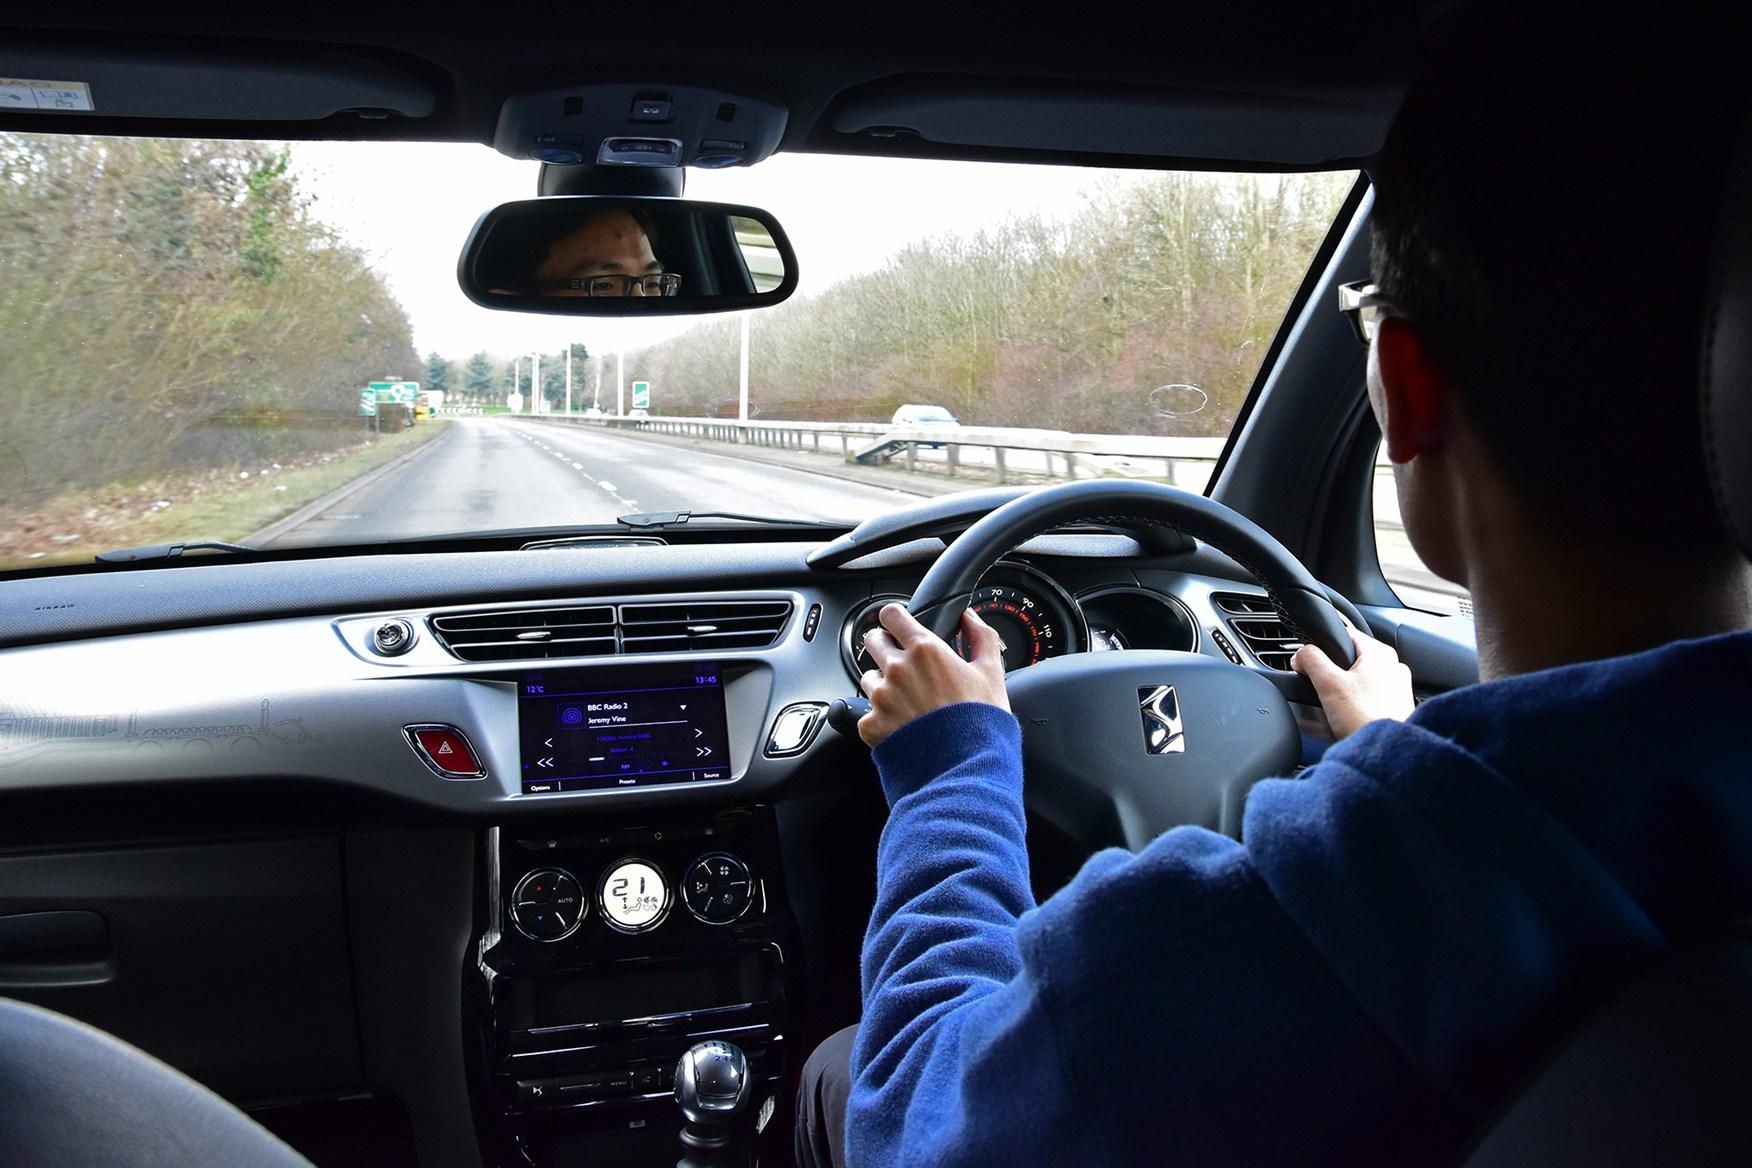 DS 3 Cabrio motorway driving